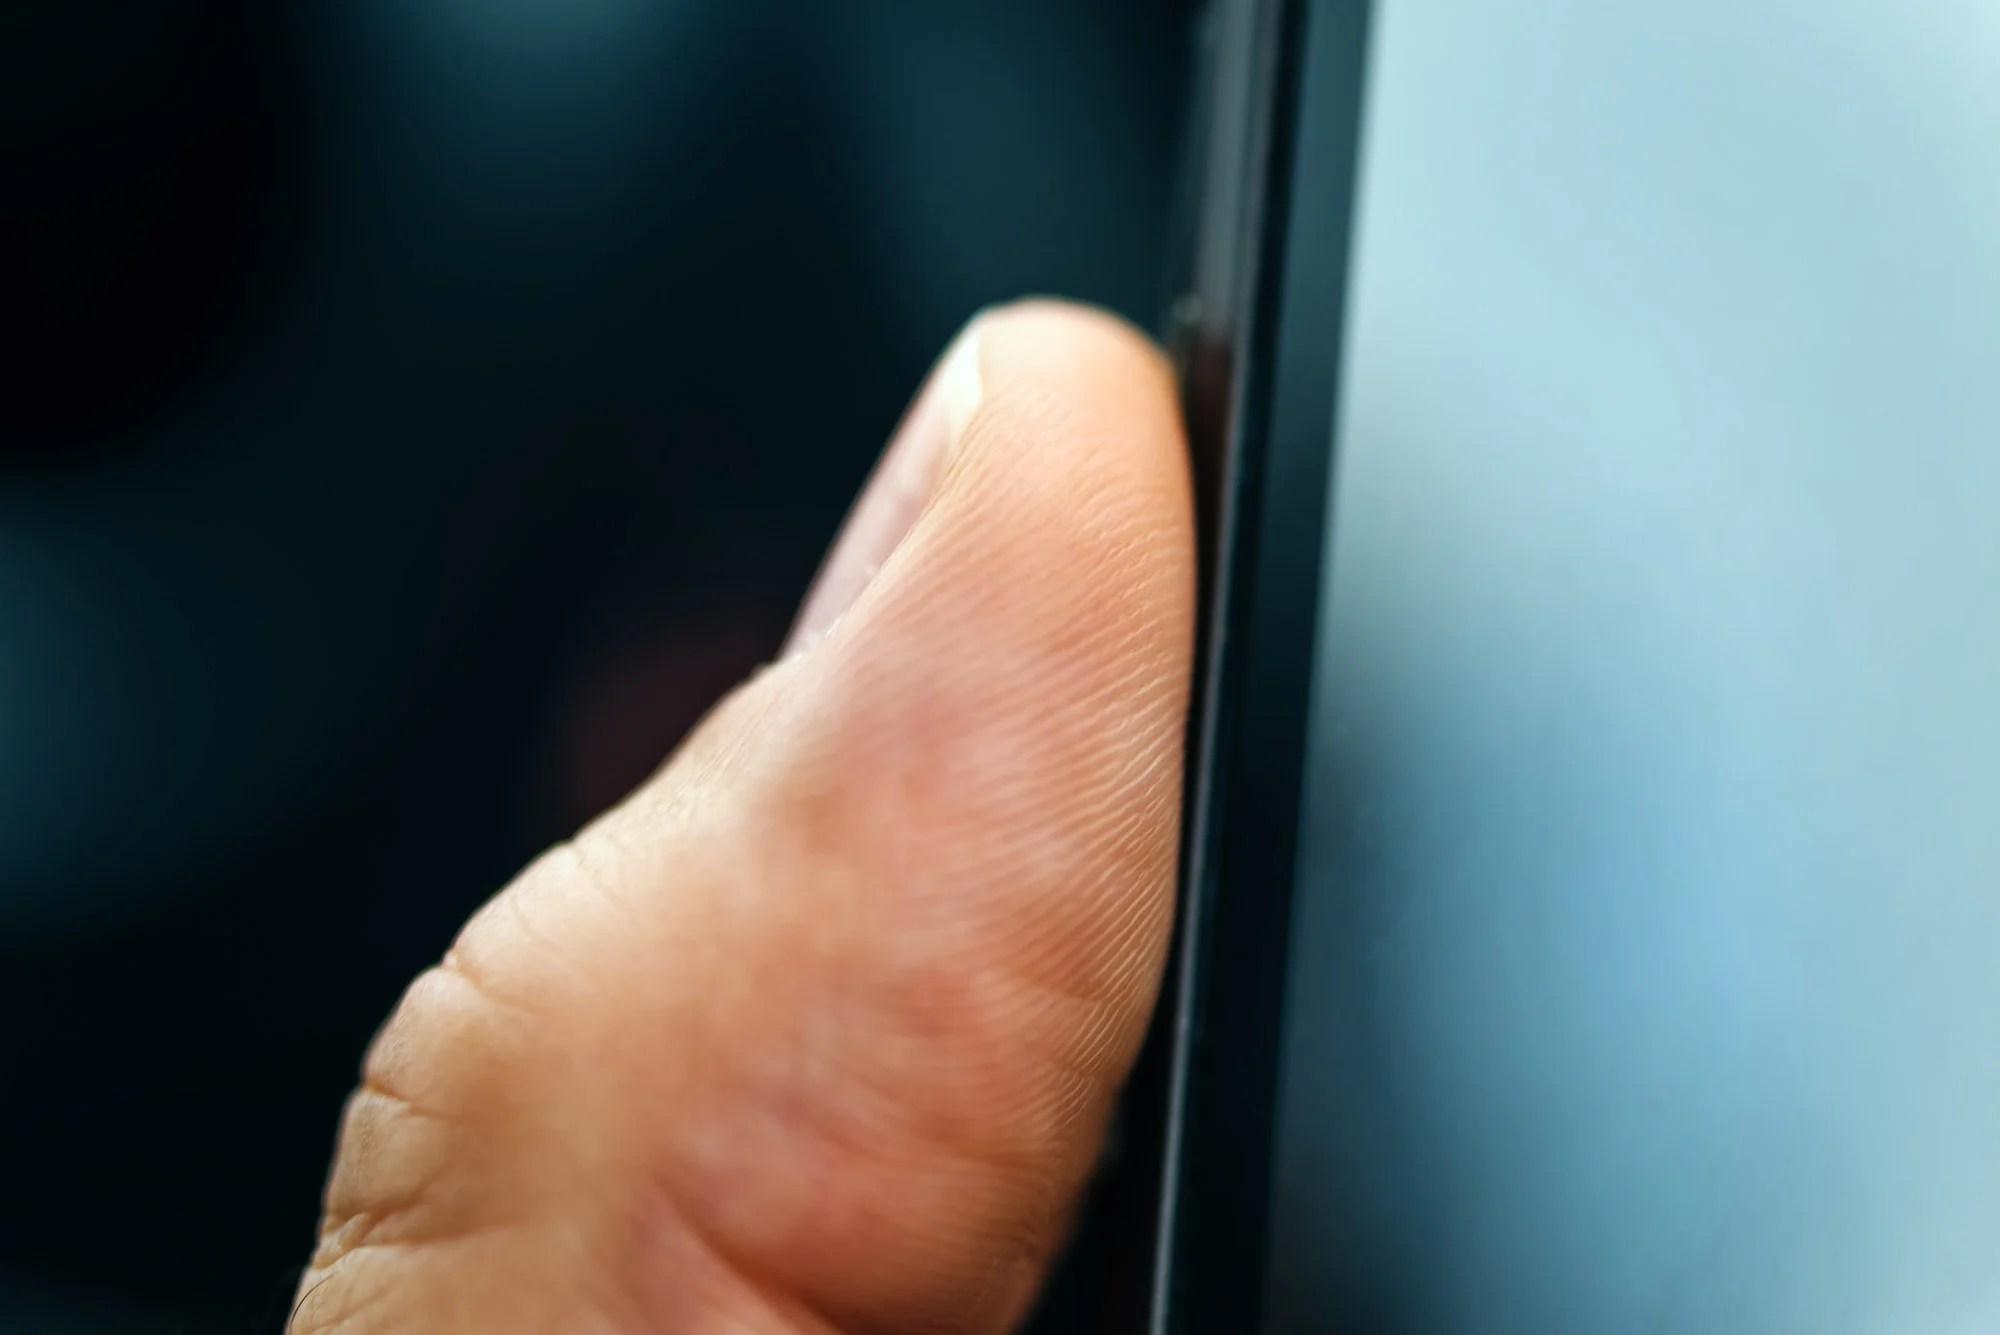 Unlocking smart phone with fingerprint sensor scan